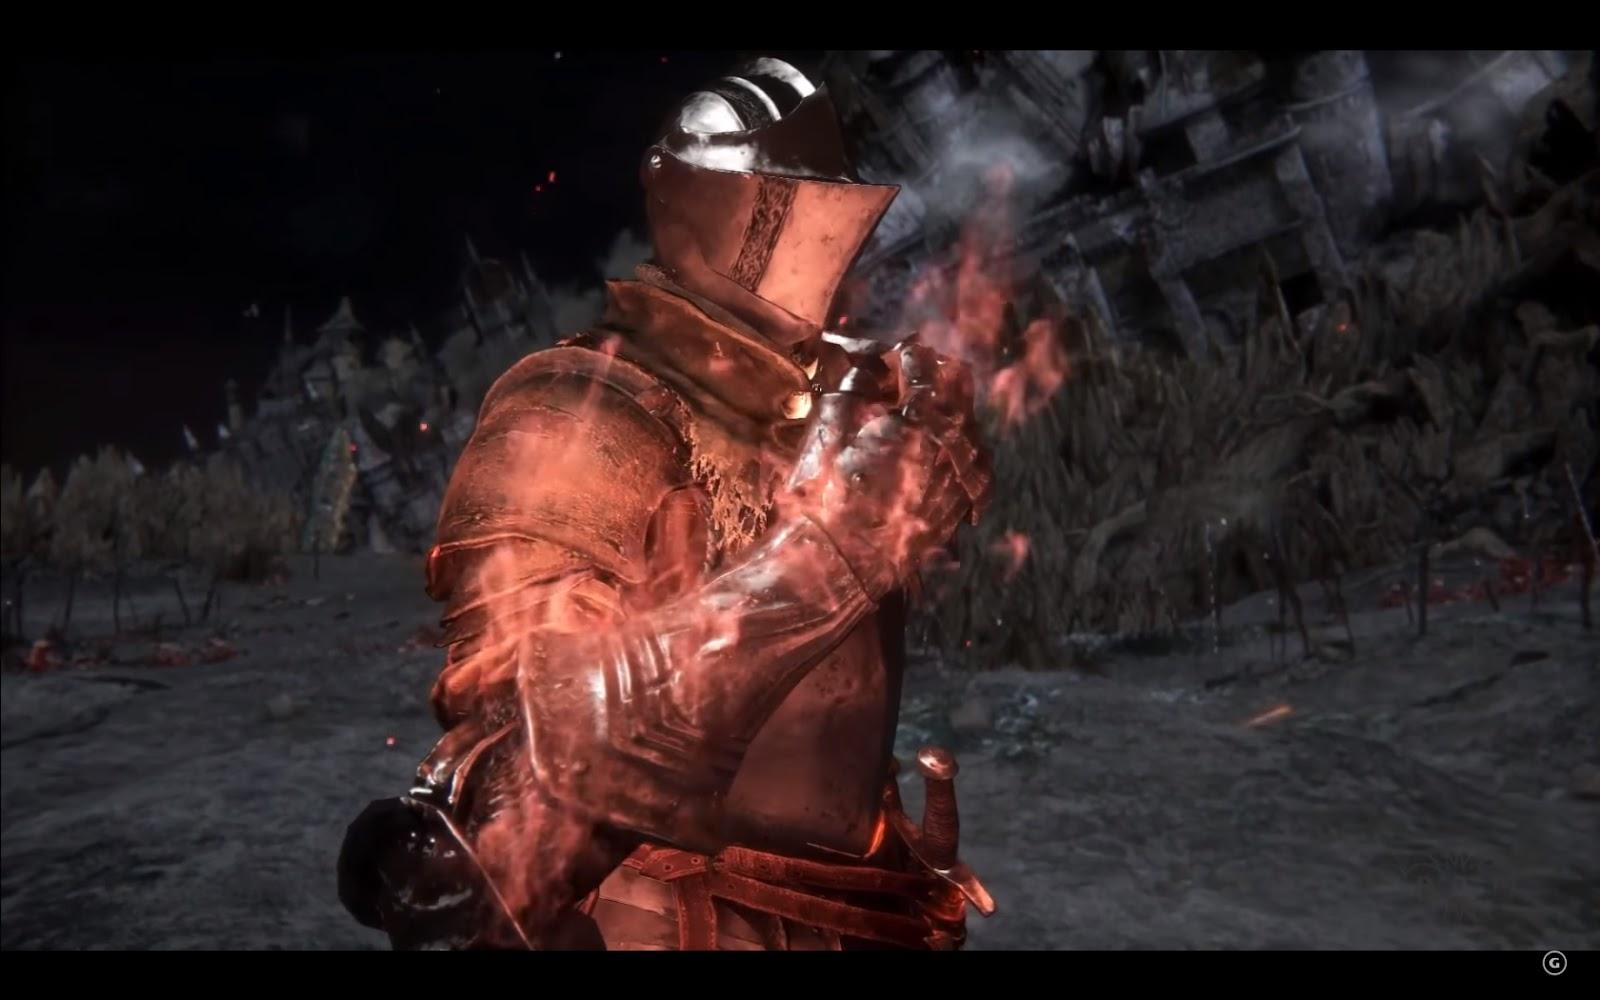 Dark Souls Iii Ash Seeketh Embers Wallpaper Engine Free